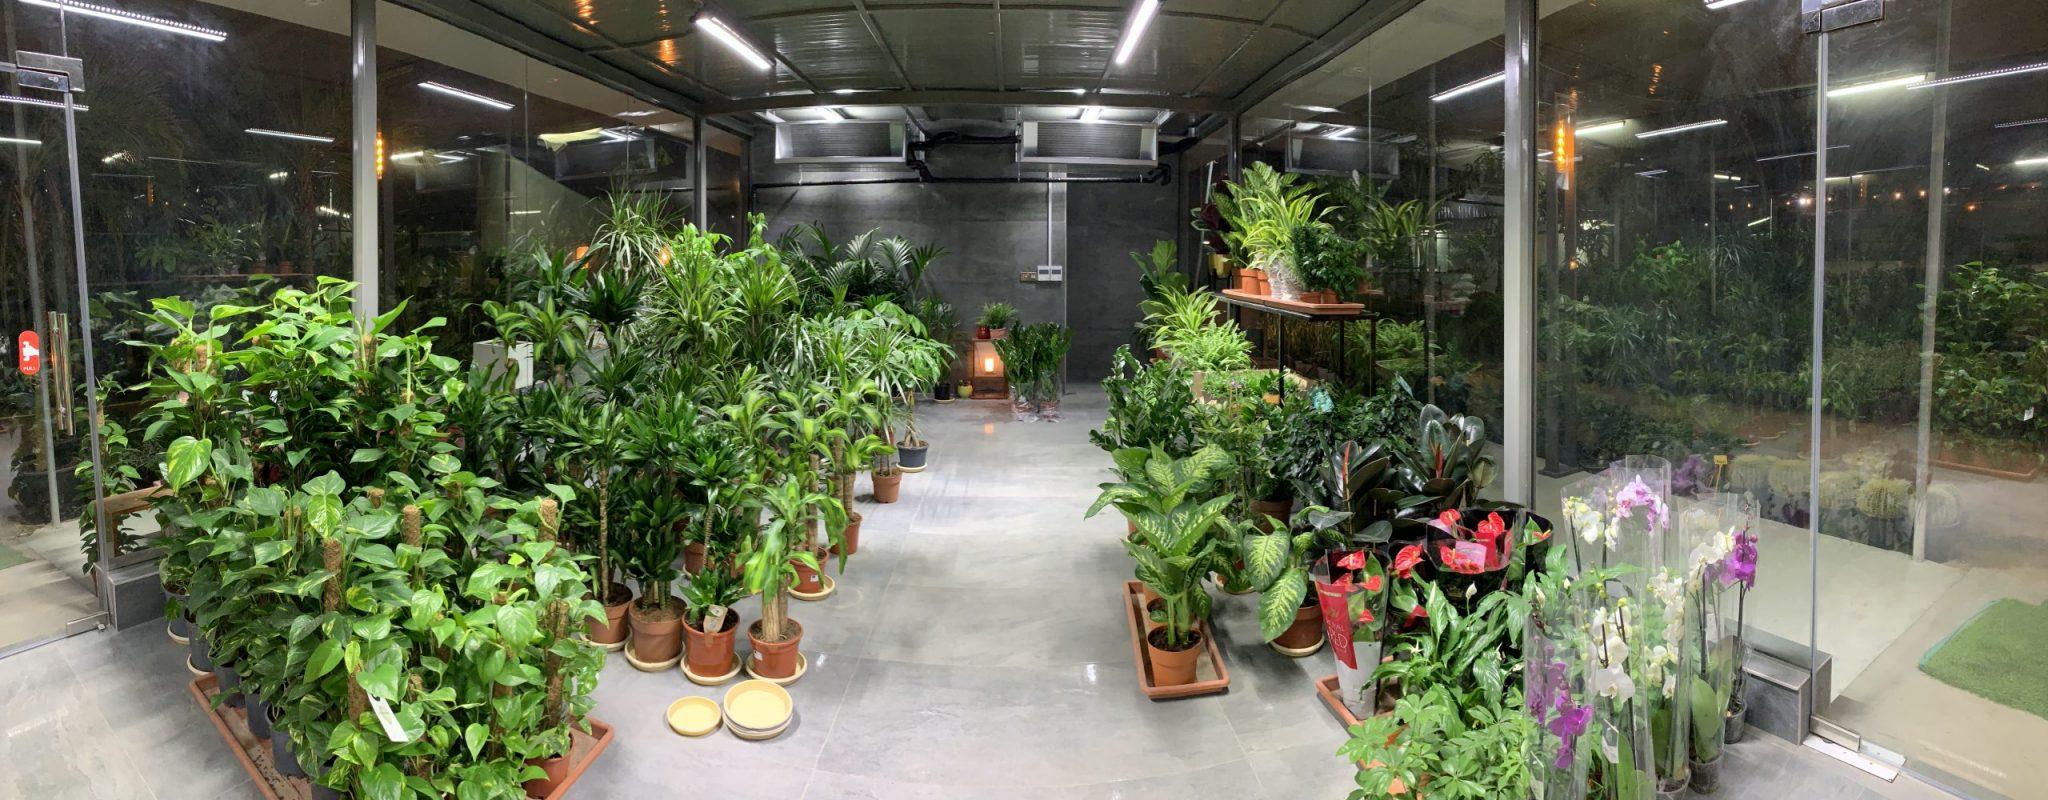 Wide collection of indoor plants